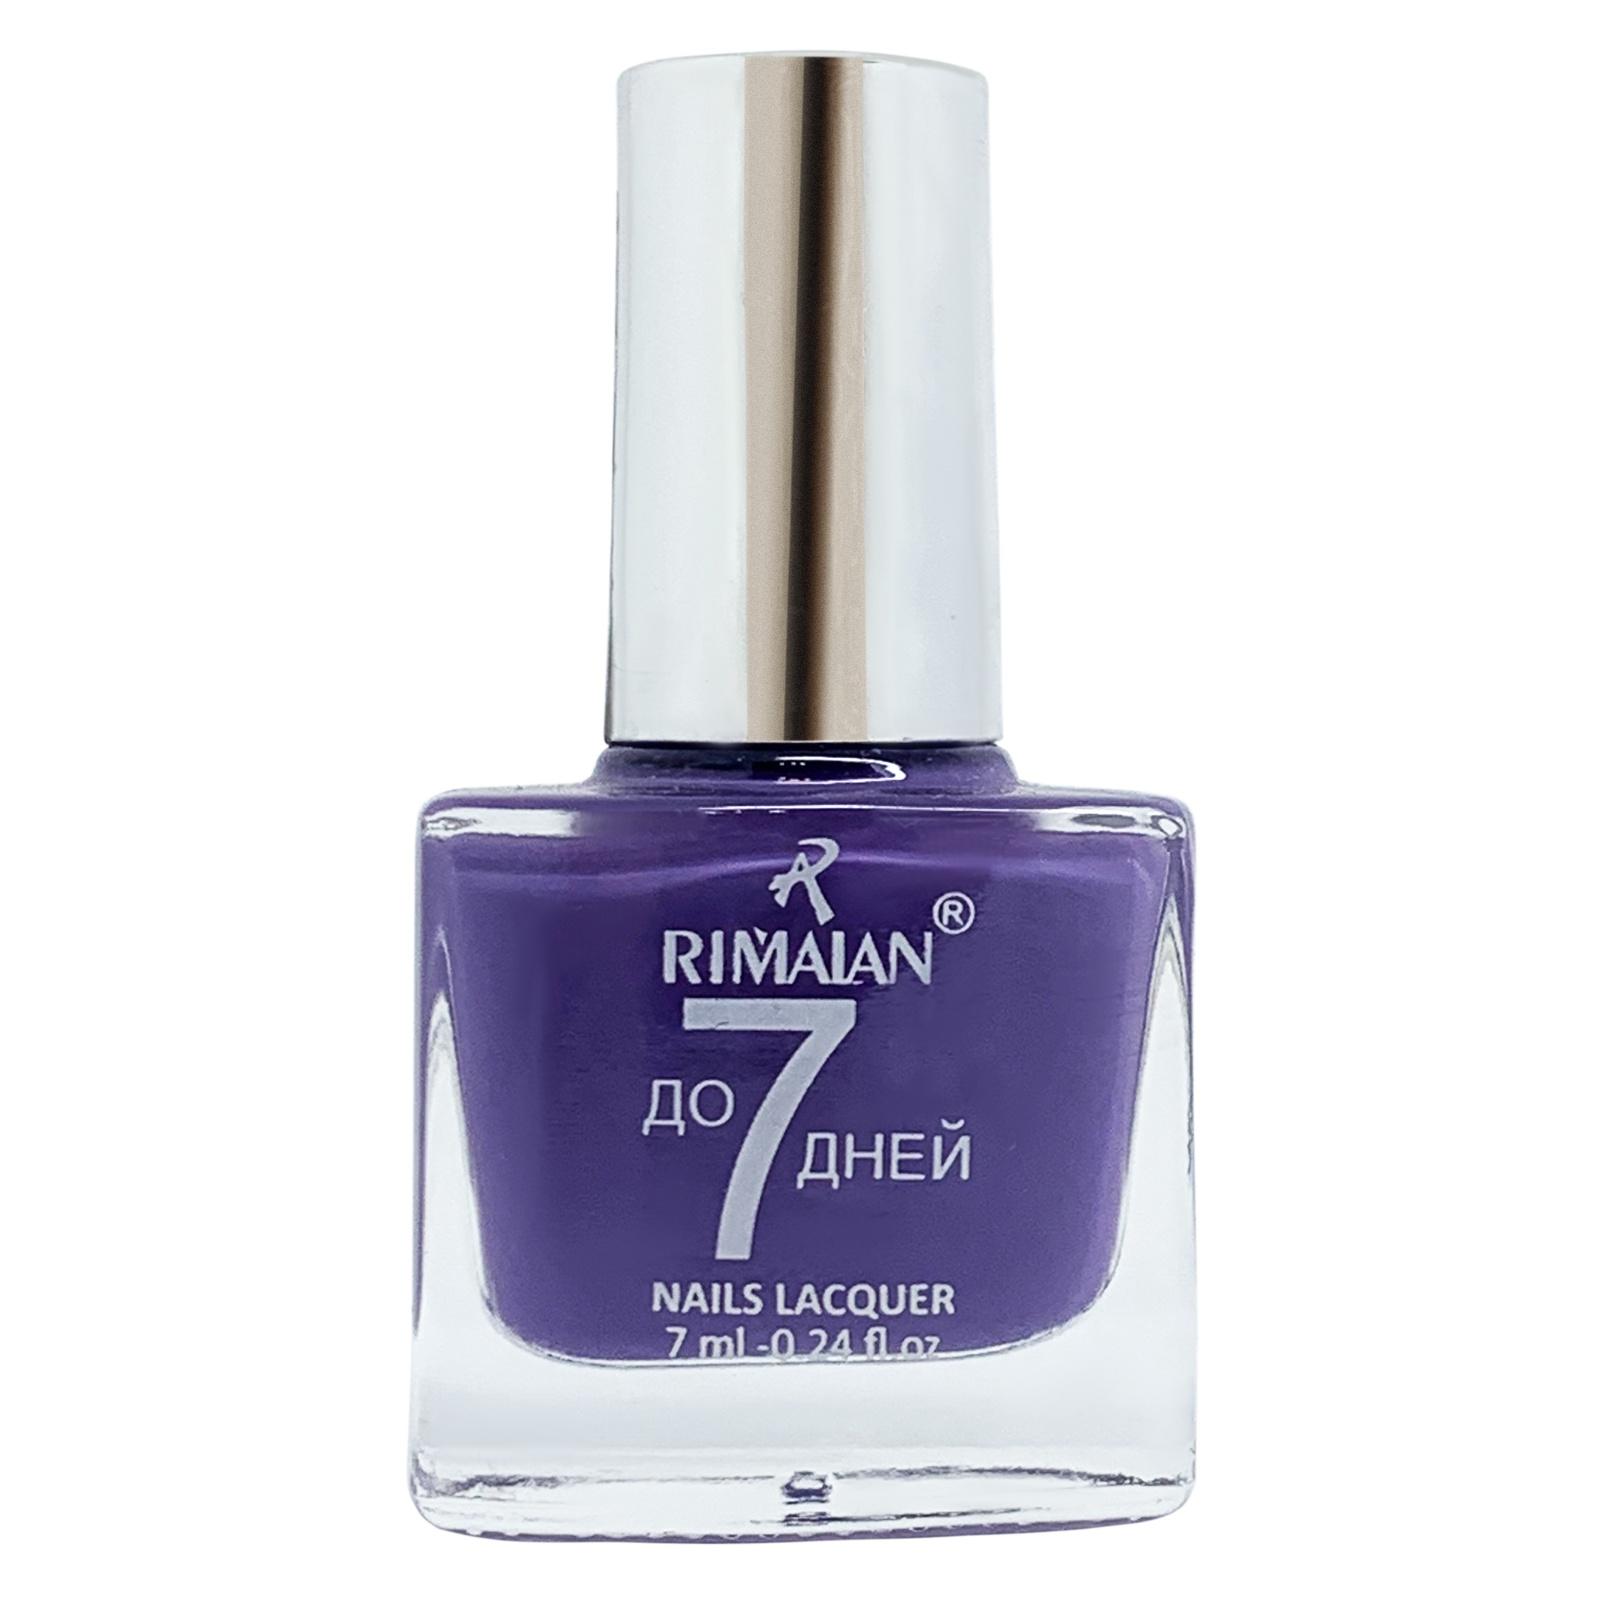 Rimalan 888-14 Лак для ногтей 7ml RNL888 до 7 дней 14 лазурь